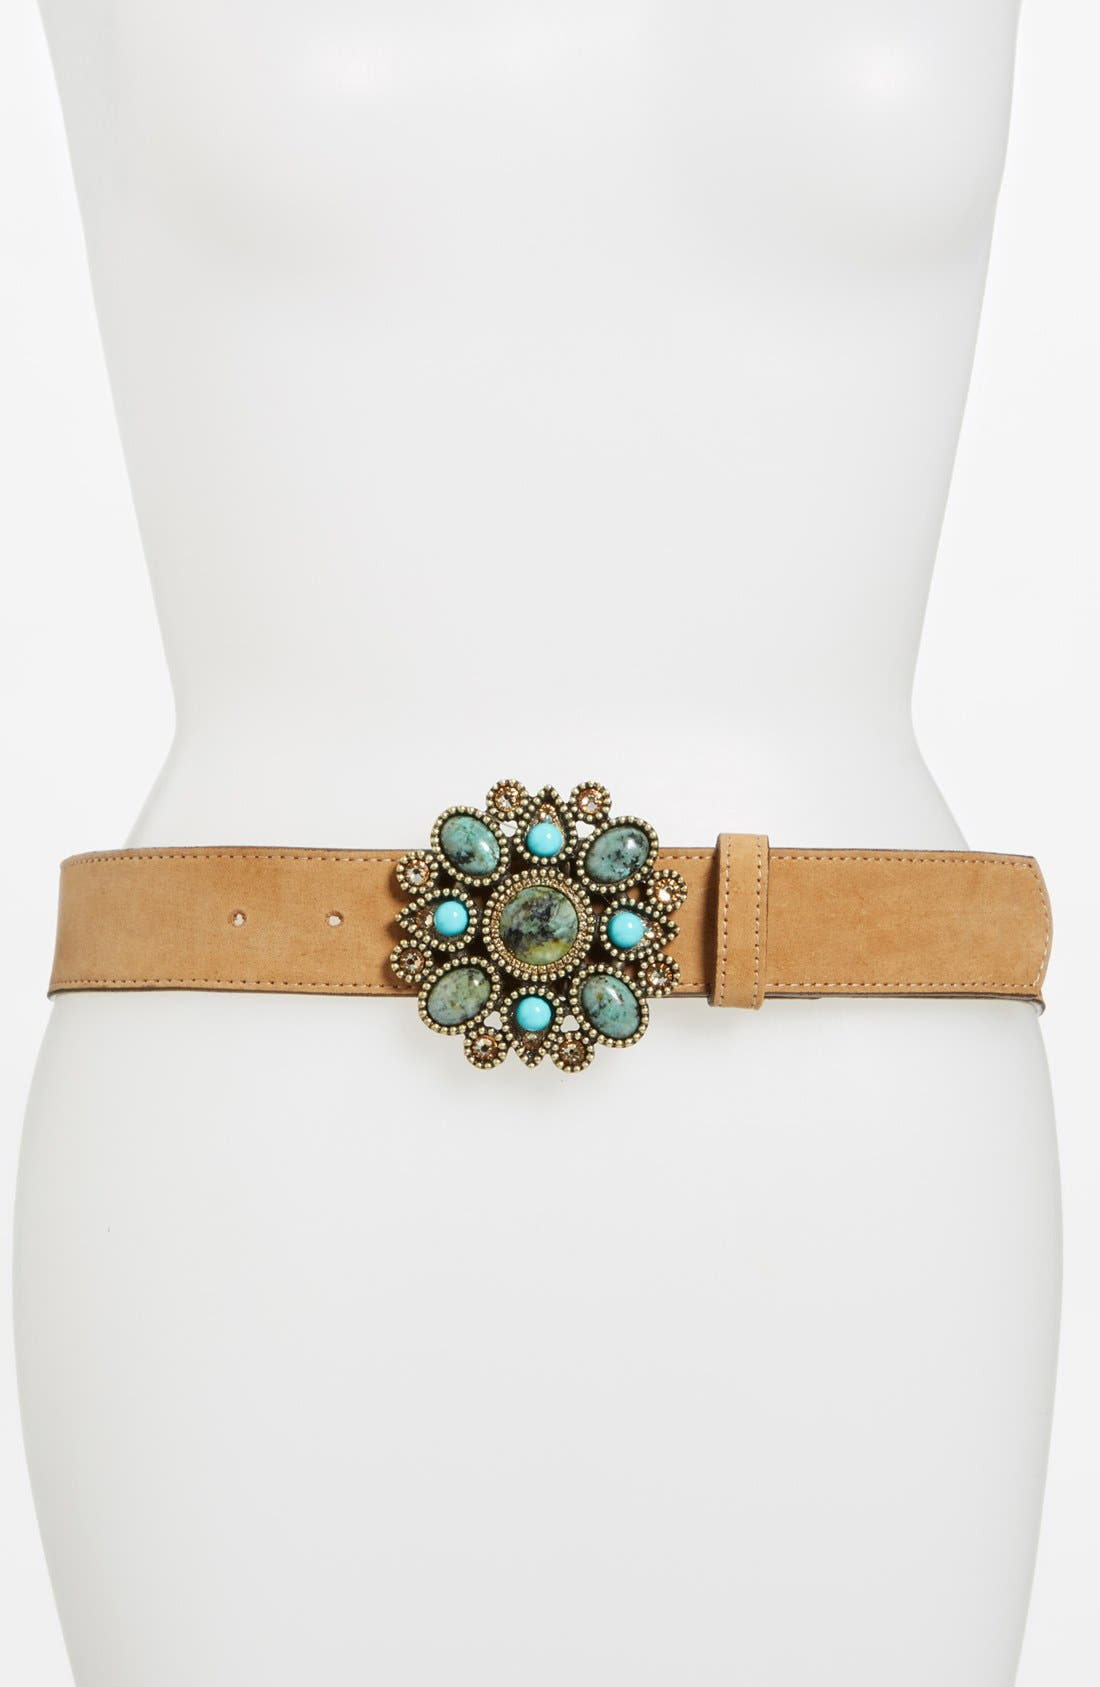 Alternate Image 1 Selected - Leatherock Turquoise Buckle Belt